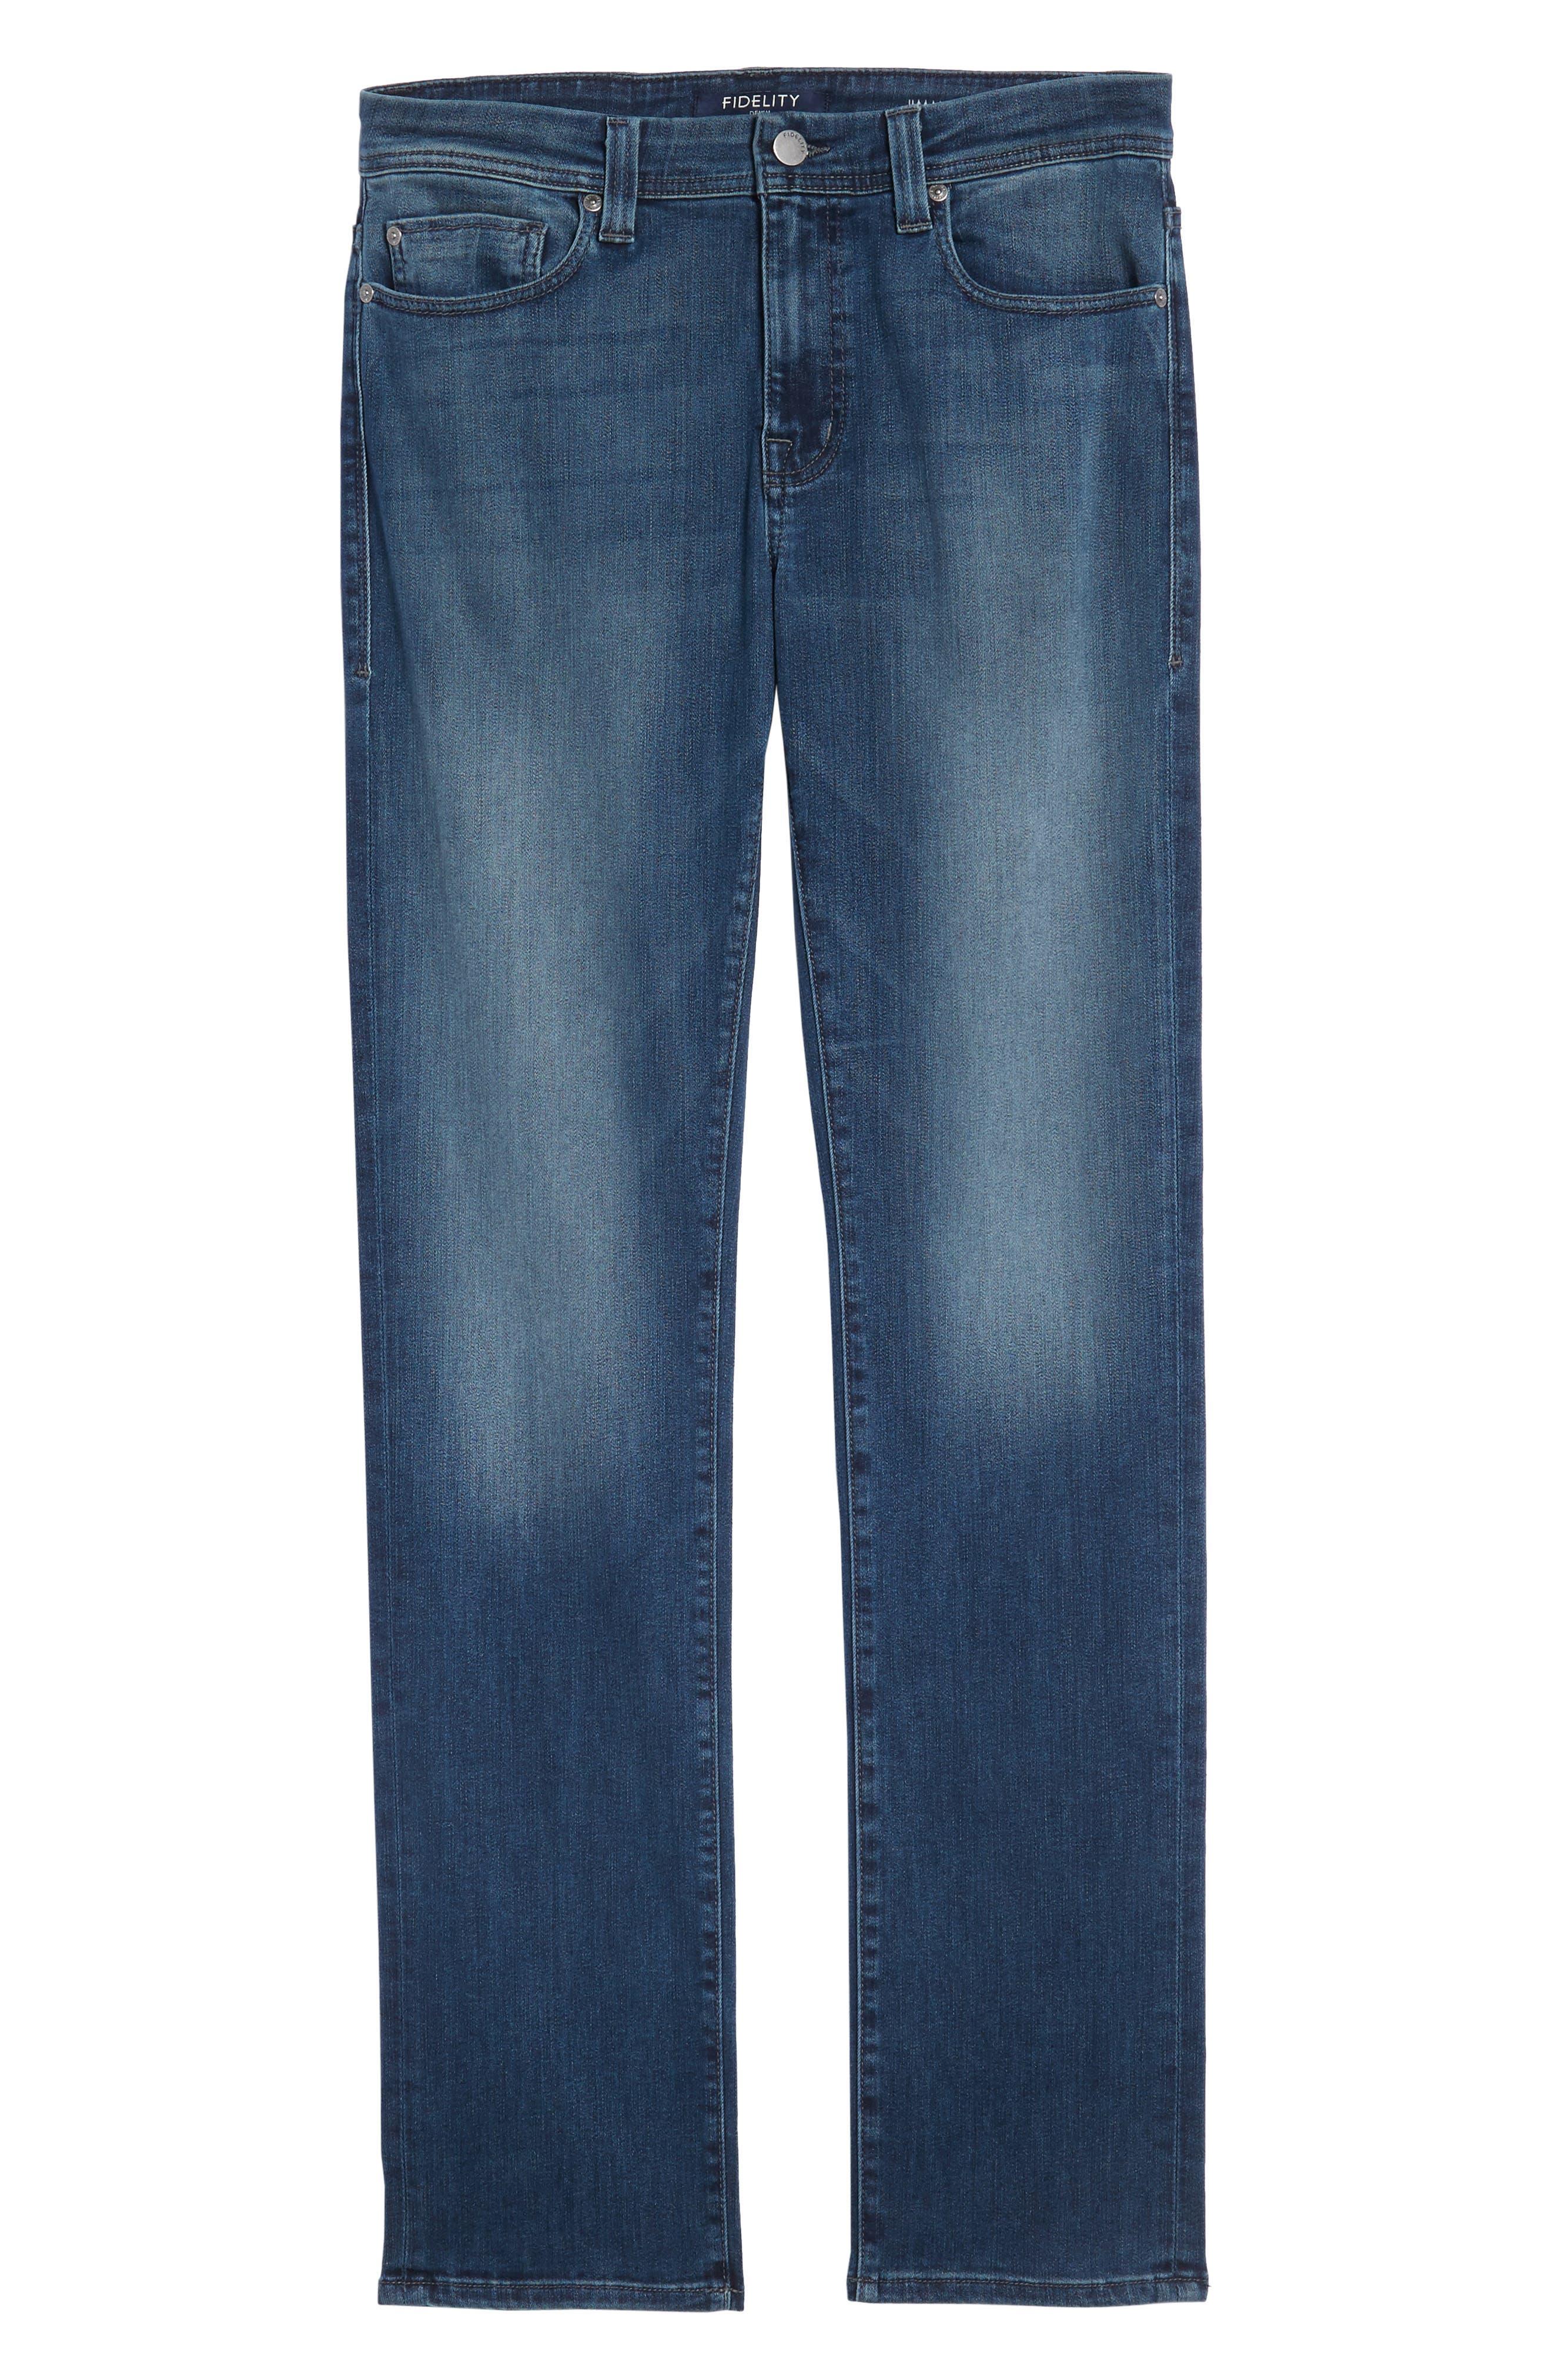 Jimmy Slim Straight Leg Jeans,                             Alternate thumbnail 6, color,                             Atlas Blue